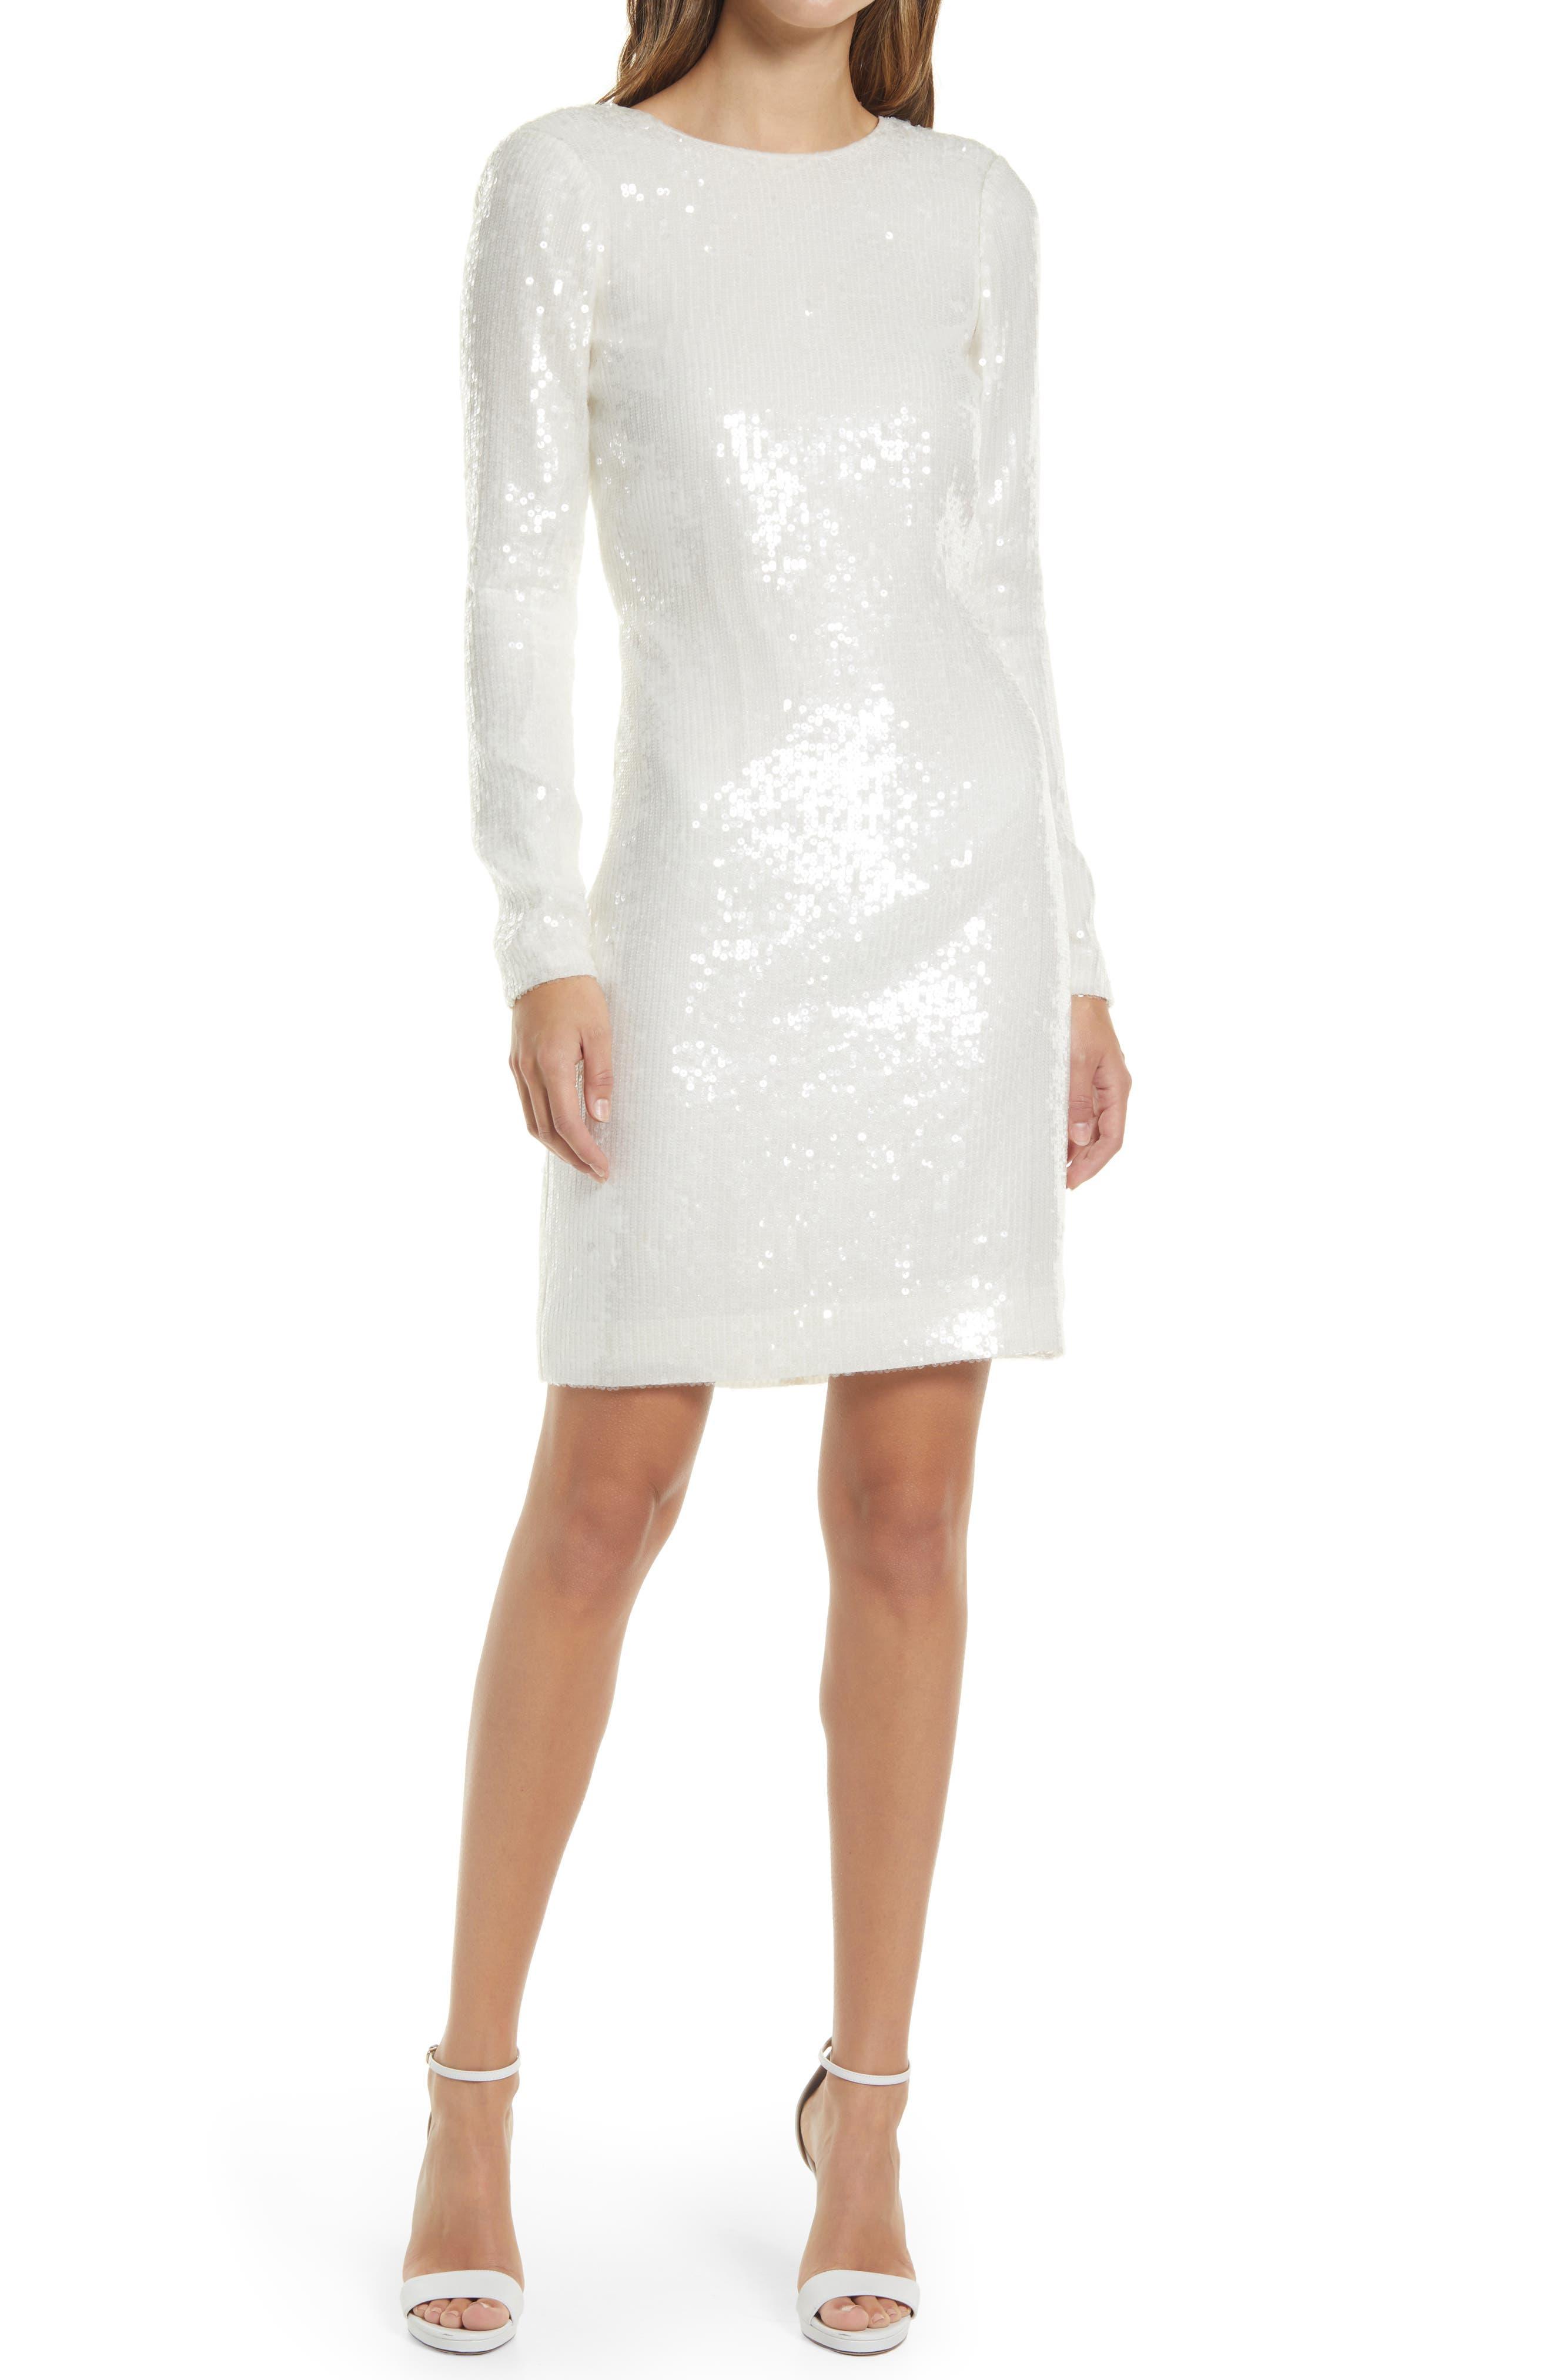 Sequin Open Back Long Sleeve Sheath Dress